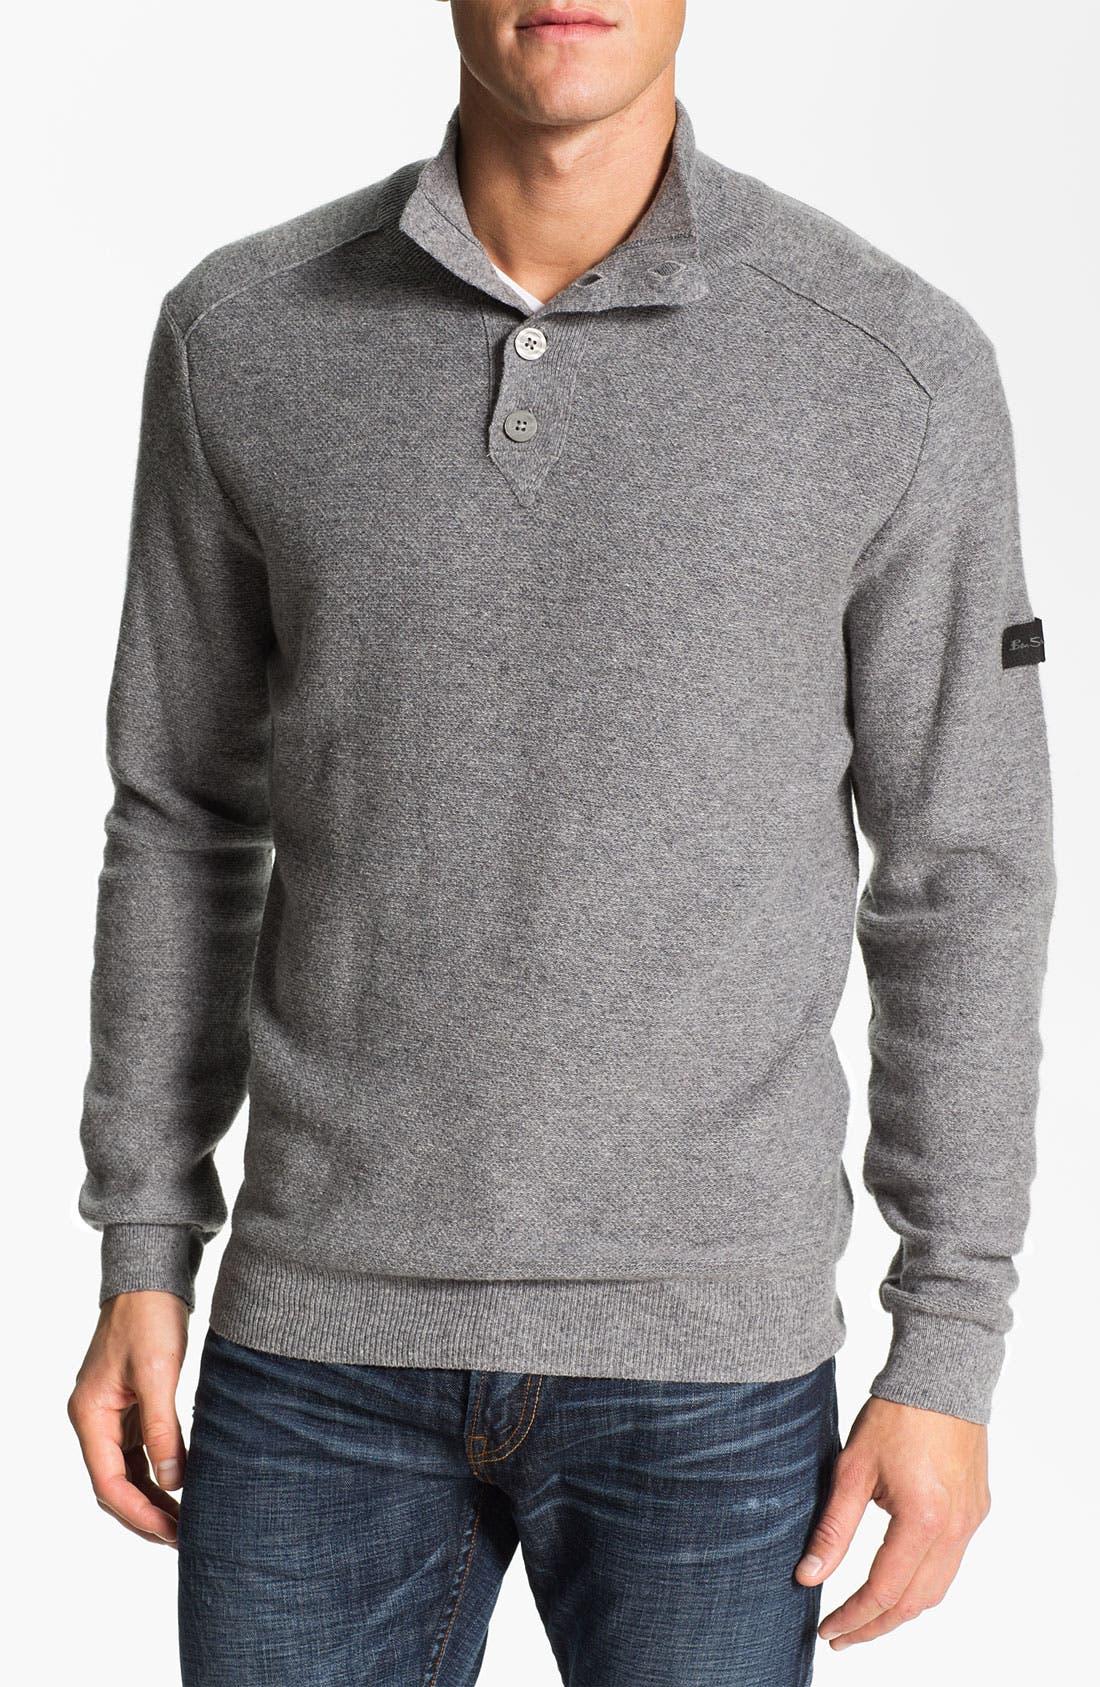 Alternate Image 1 Selected - Ben Sherman Mock Neck Sweater